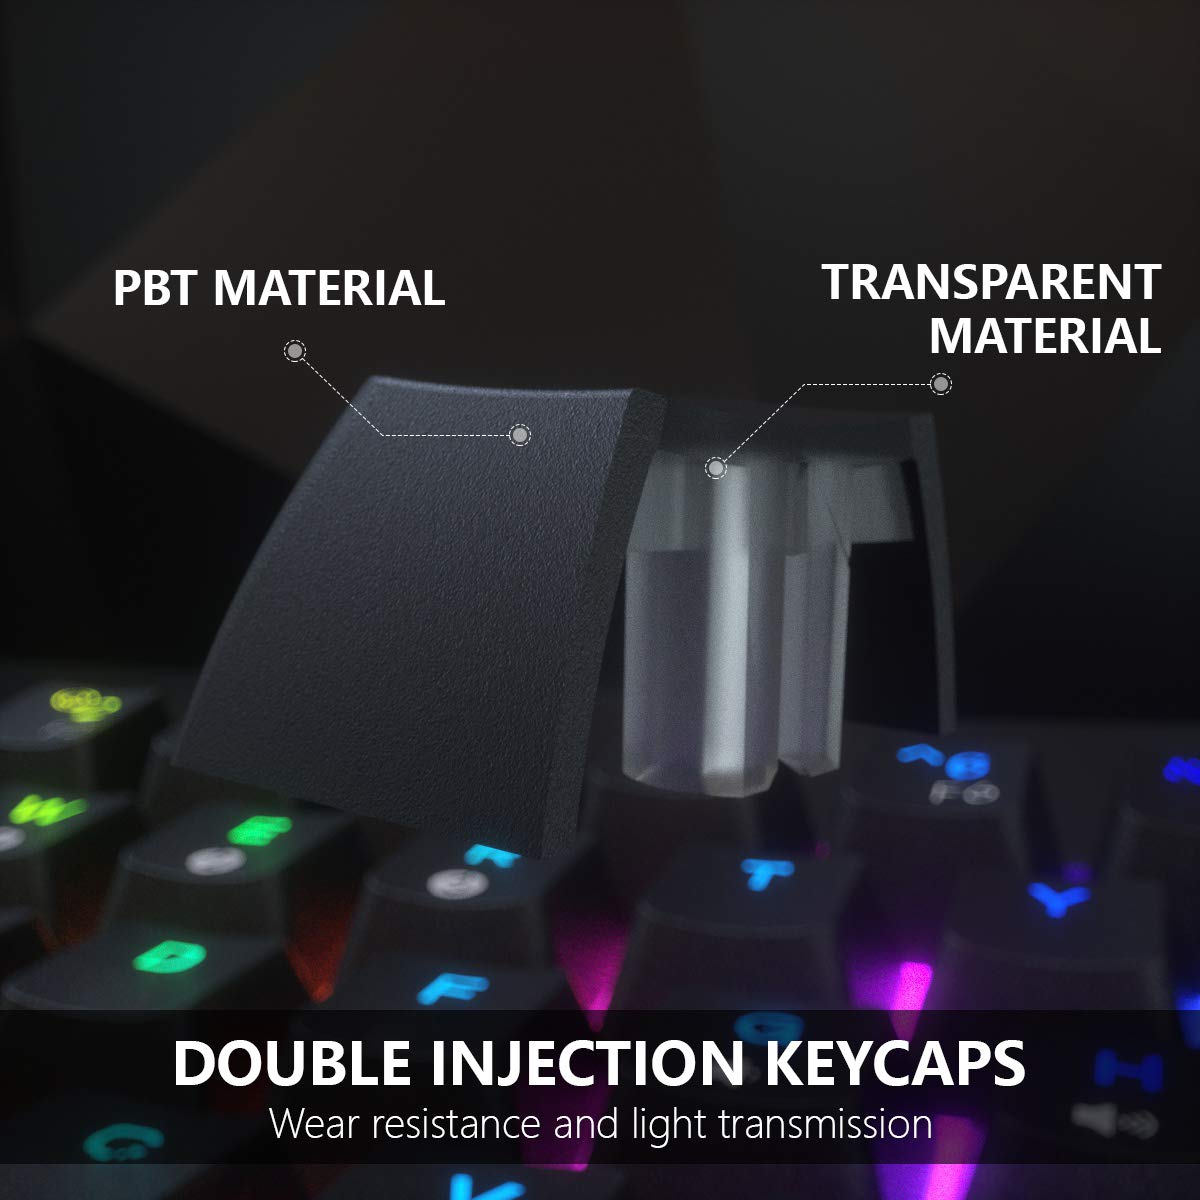 DIERYA DK61E 60% Mechanical Gaming Keyboard, RGB Backlit Wired PBT Keycap Waterproof Type-C Mini Compact 61 Keys Computer Keyboard with Full Keys Programmable (Gateron Optical Brown Switch)